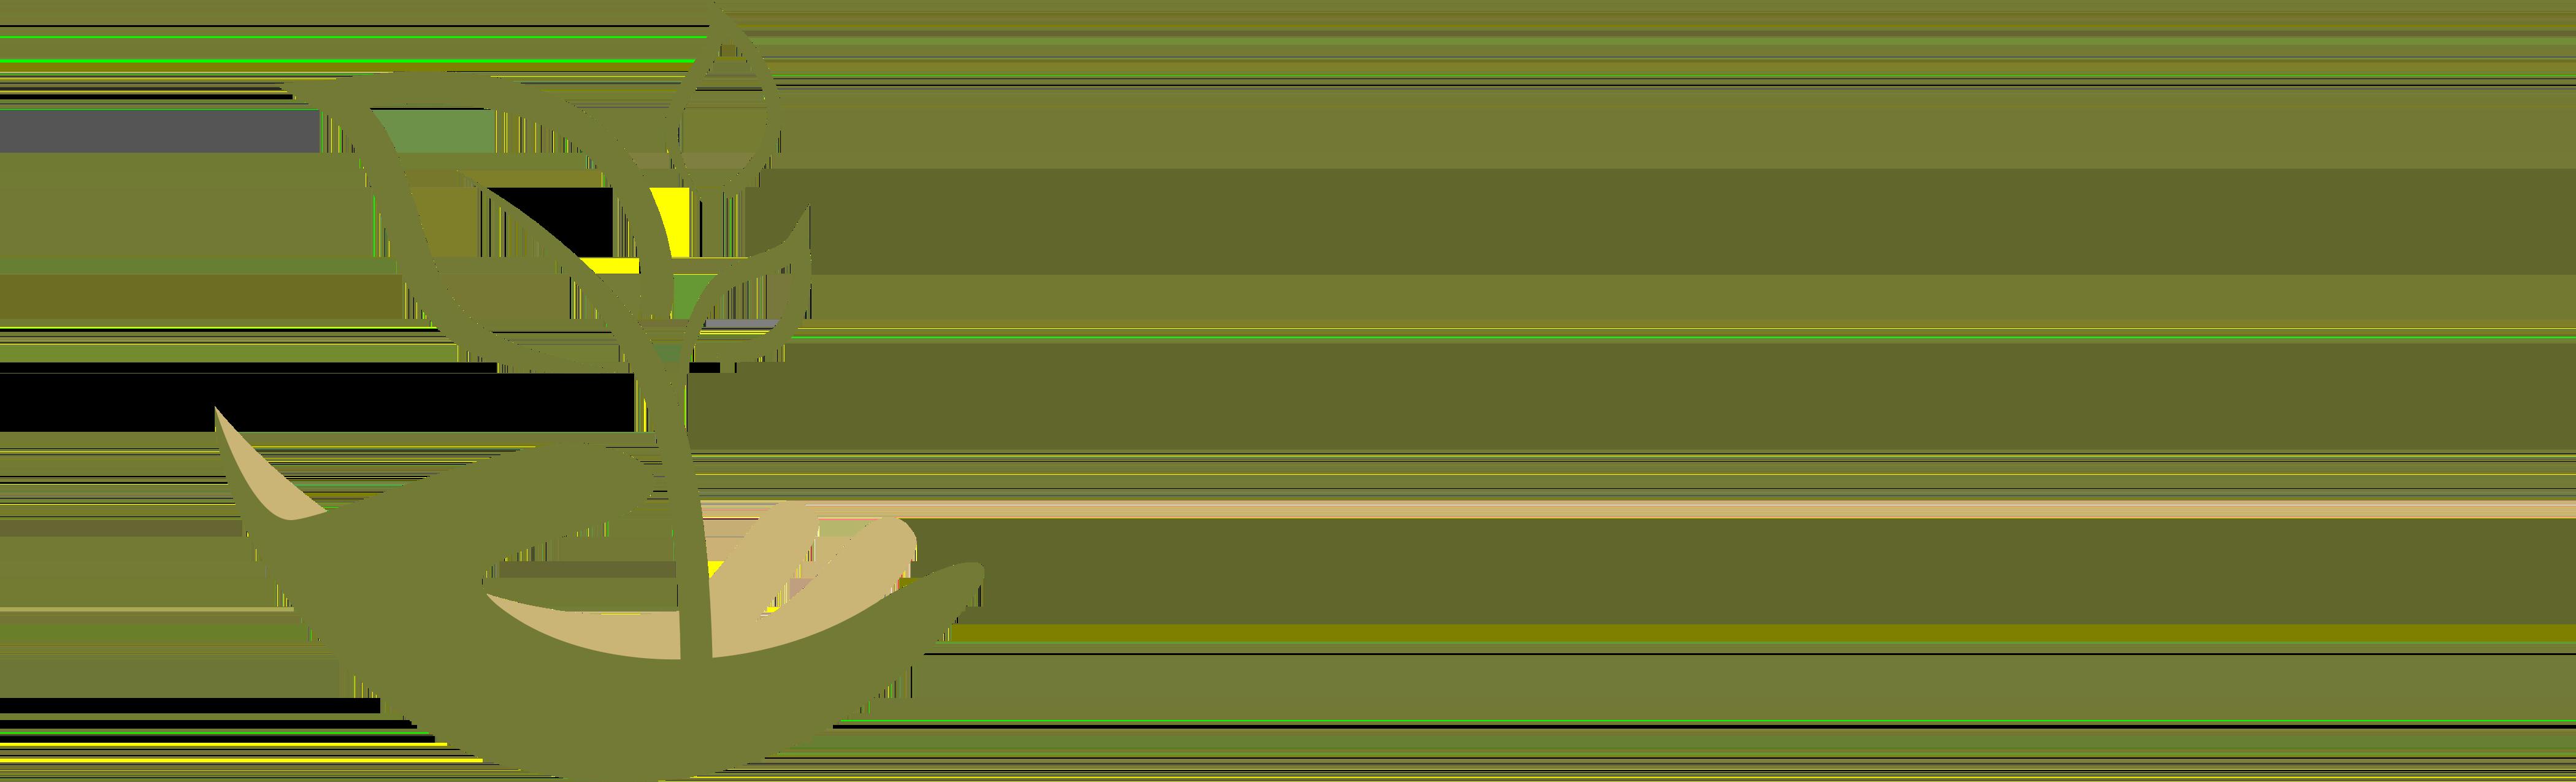 Sudbury Community Garden Network